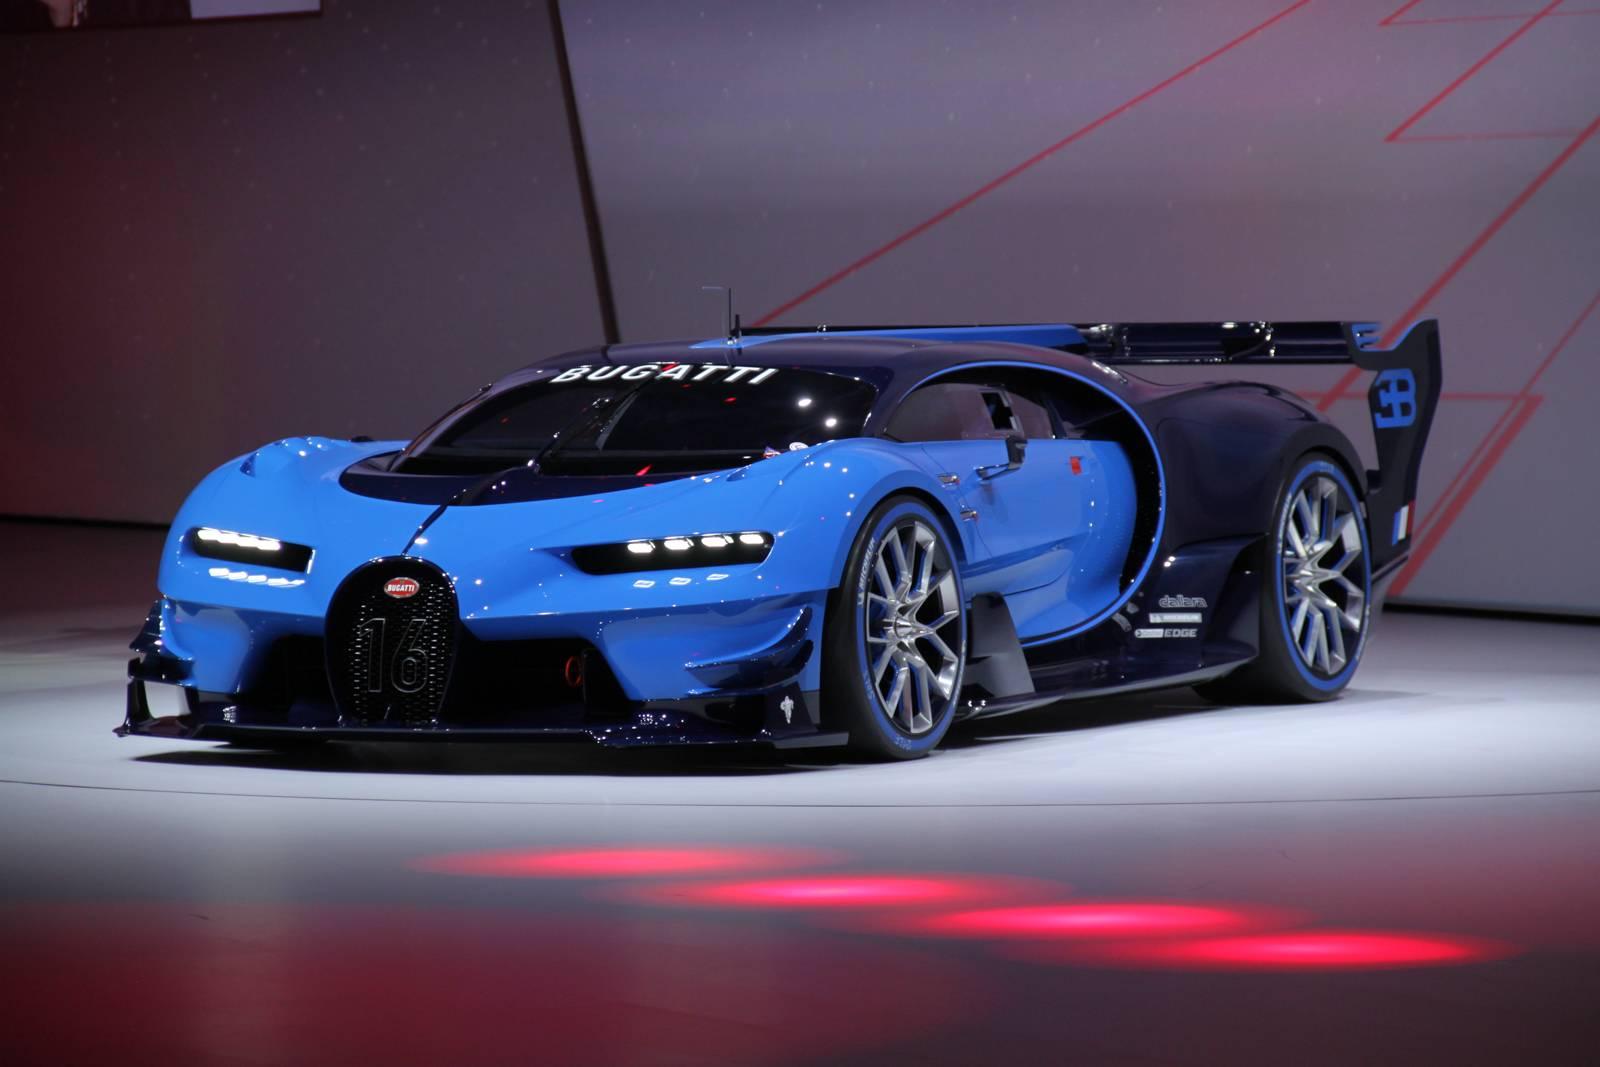 Benz Car Wallpapers Free Download Top 10 Vision Gt Cars For Gran Turismo 6 Gtspirit